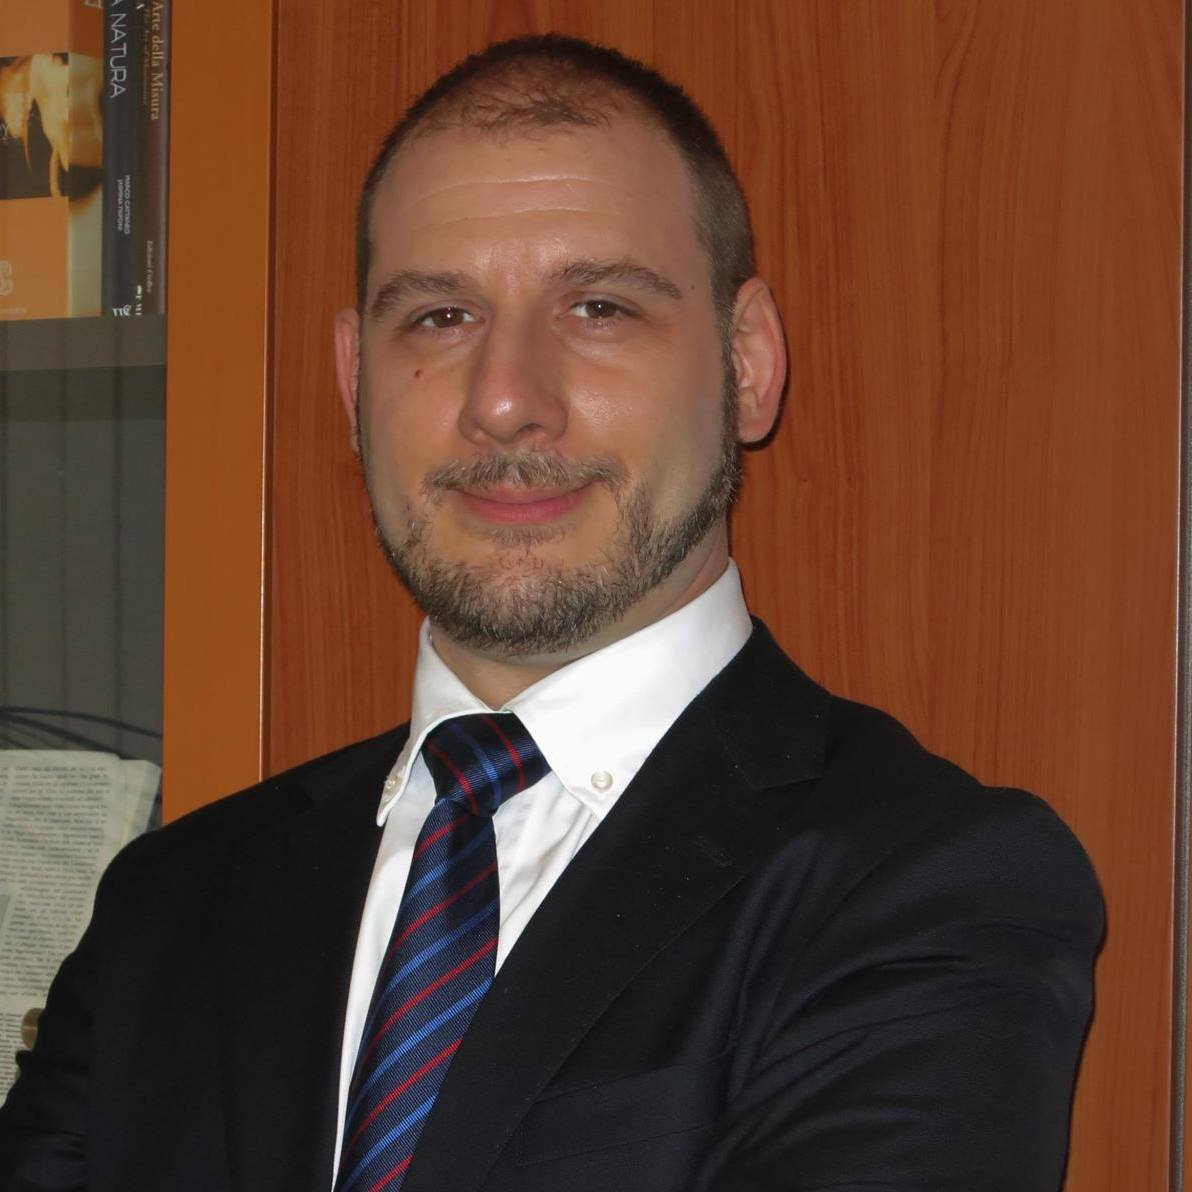 Antonio Maria Tambato